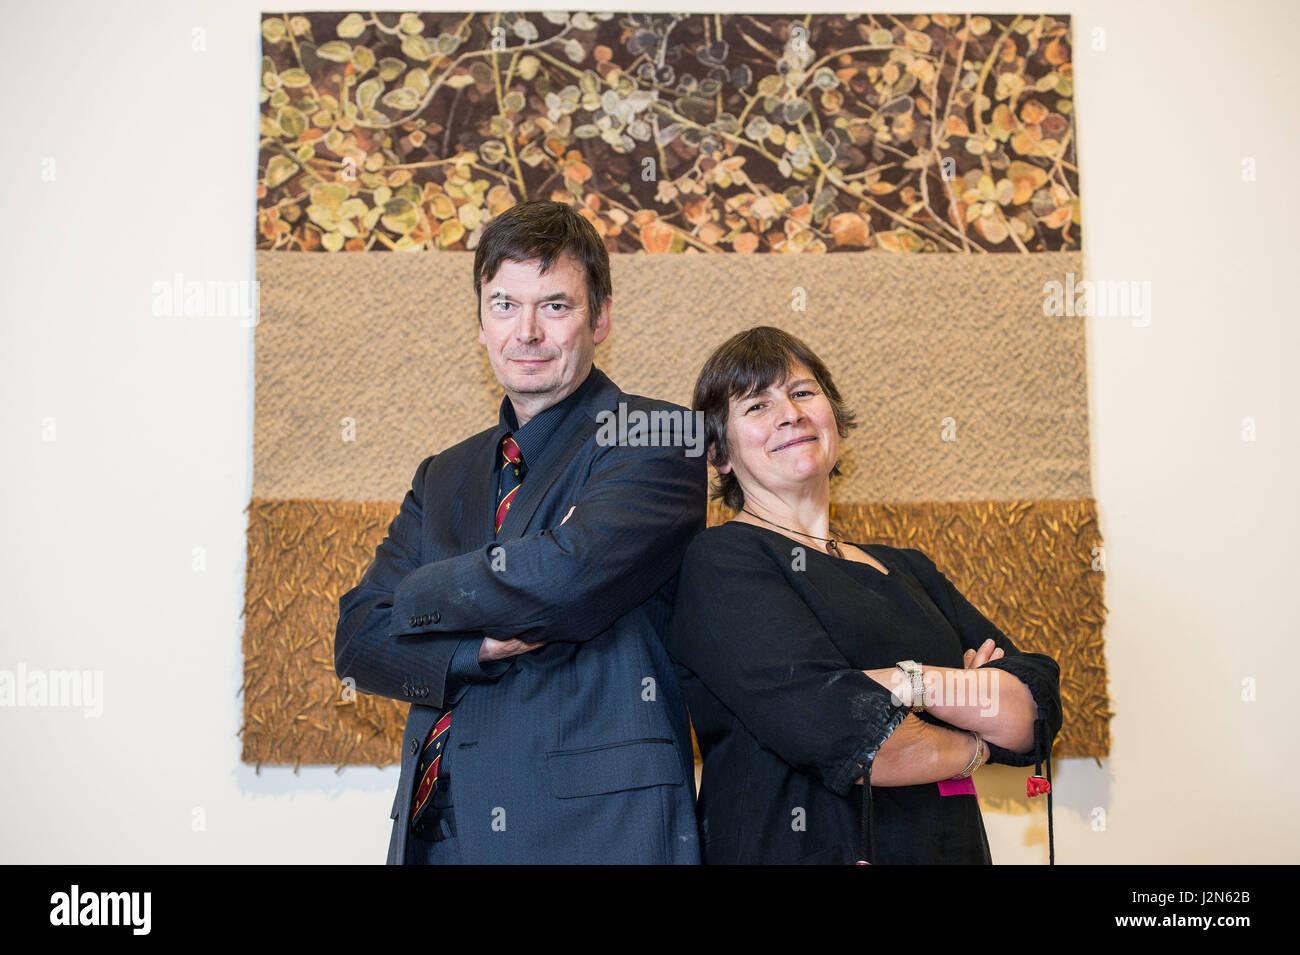 Photographer Ian Georgeson, 07921 567360 Ian Rankin and Miranda Harvey (Rankin's wife) with the winner of there - Stock Image